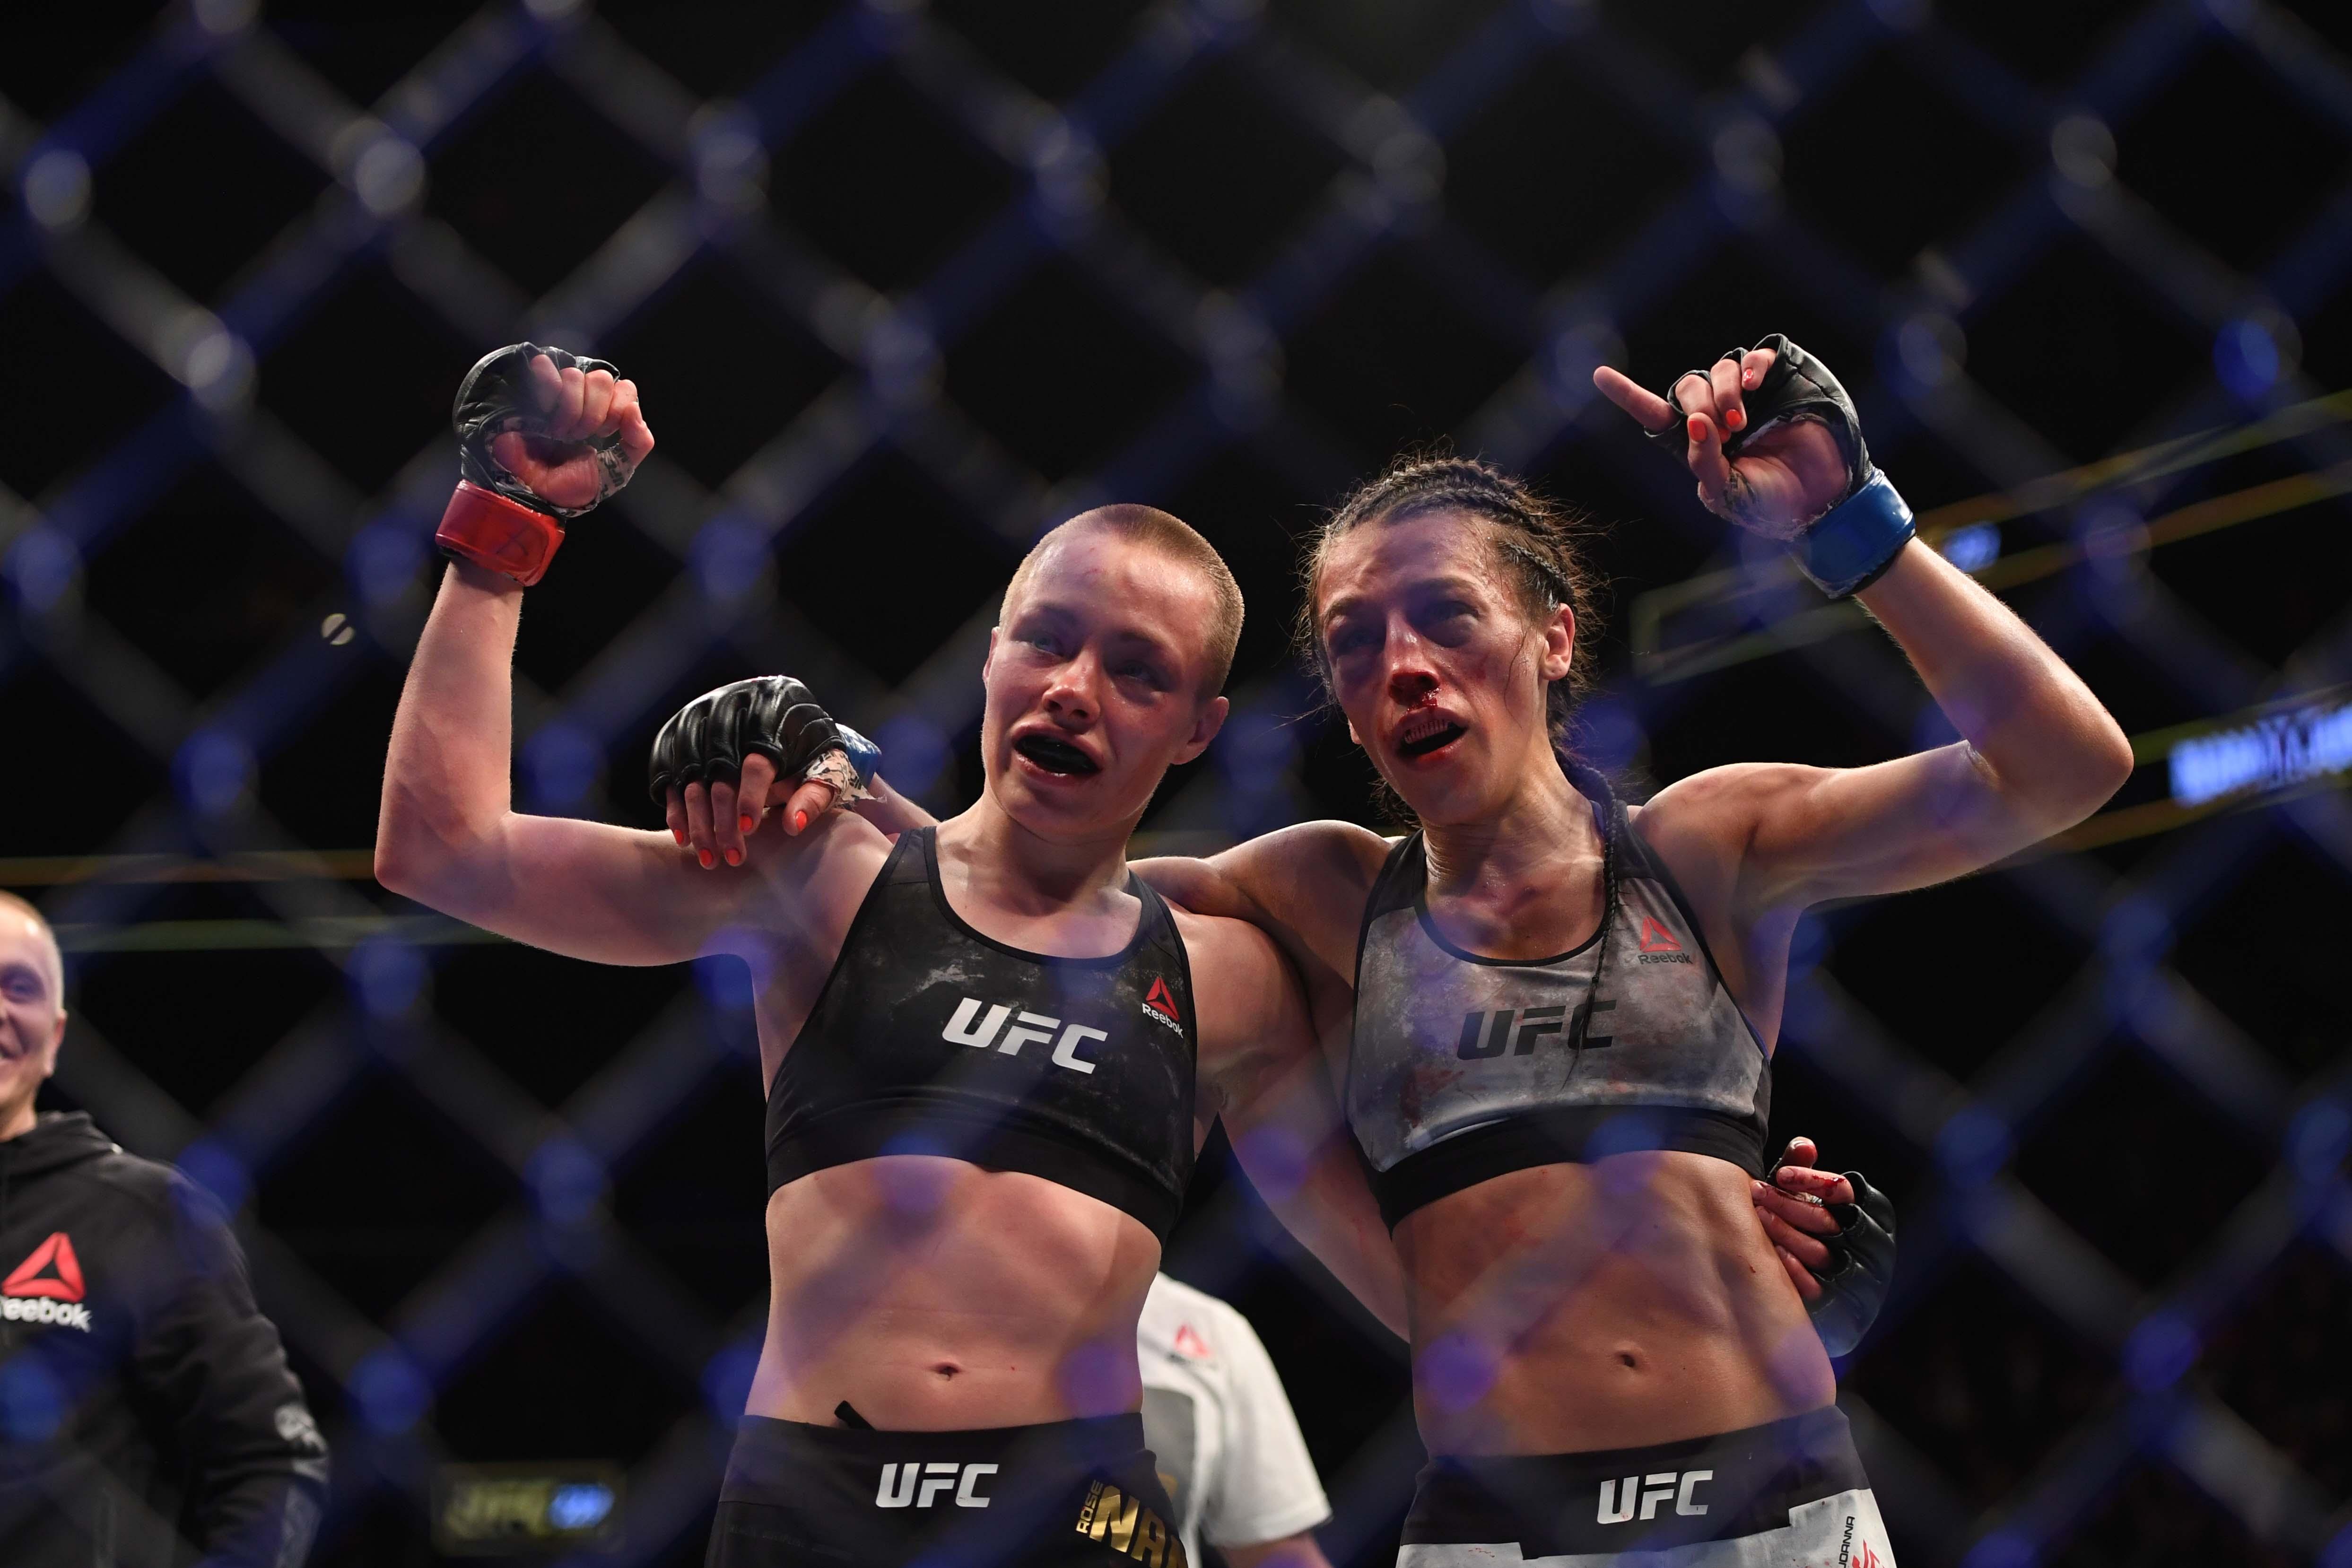 Joanna Jedrzejczyk responds to Rose Namajunas' UFC 237 title loss